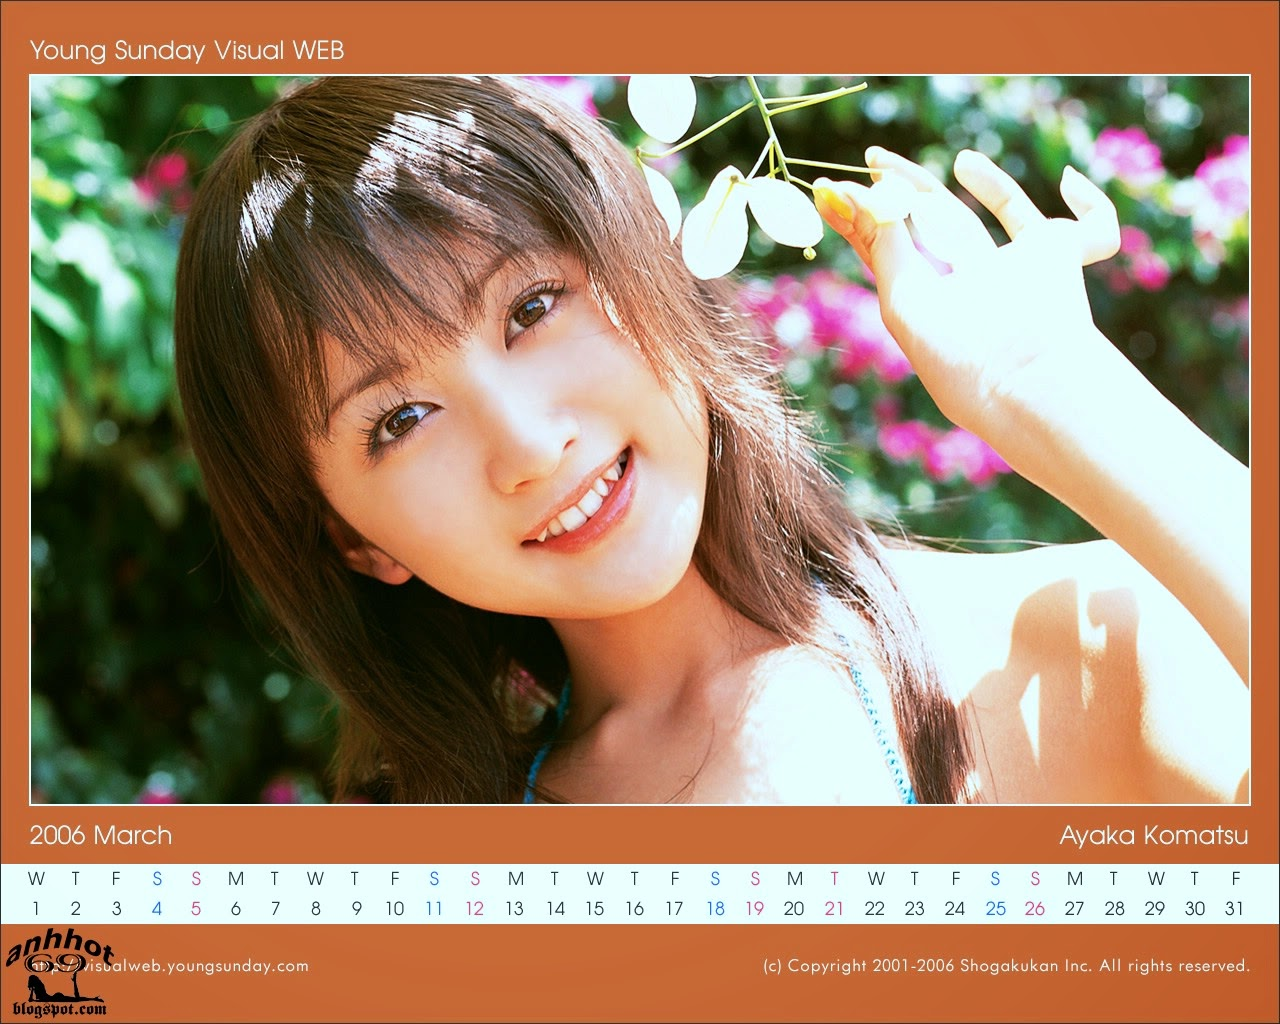 ayaka-komatsu-00403957